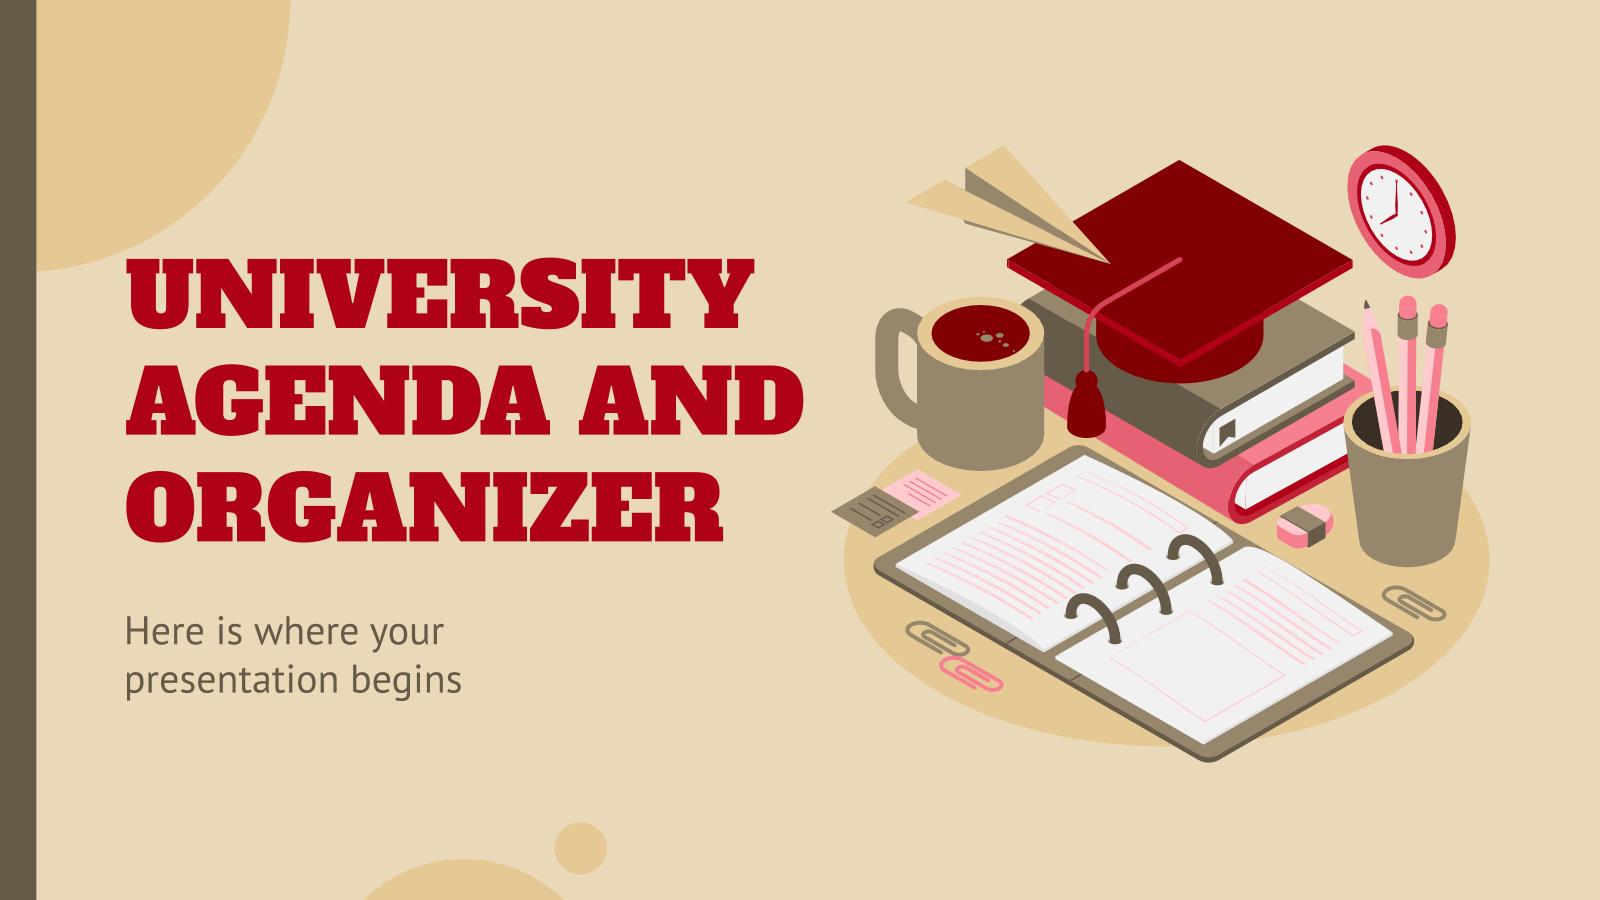 University Agenda and Organizer presentation template